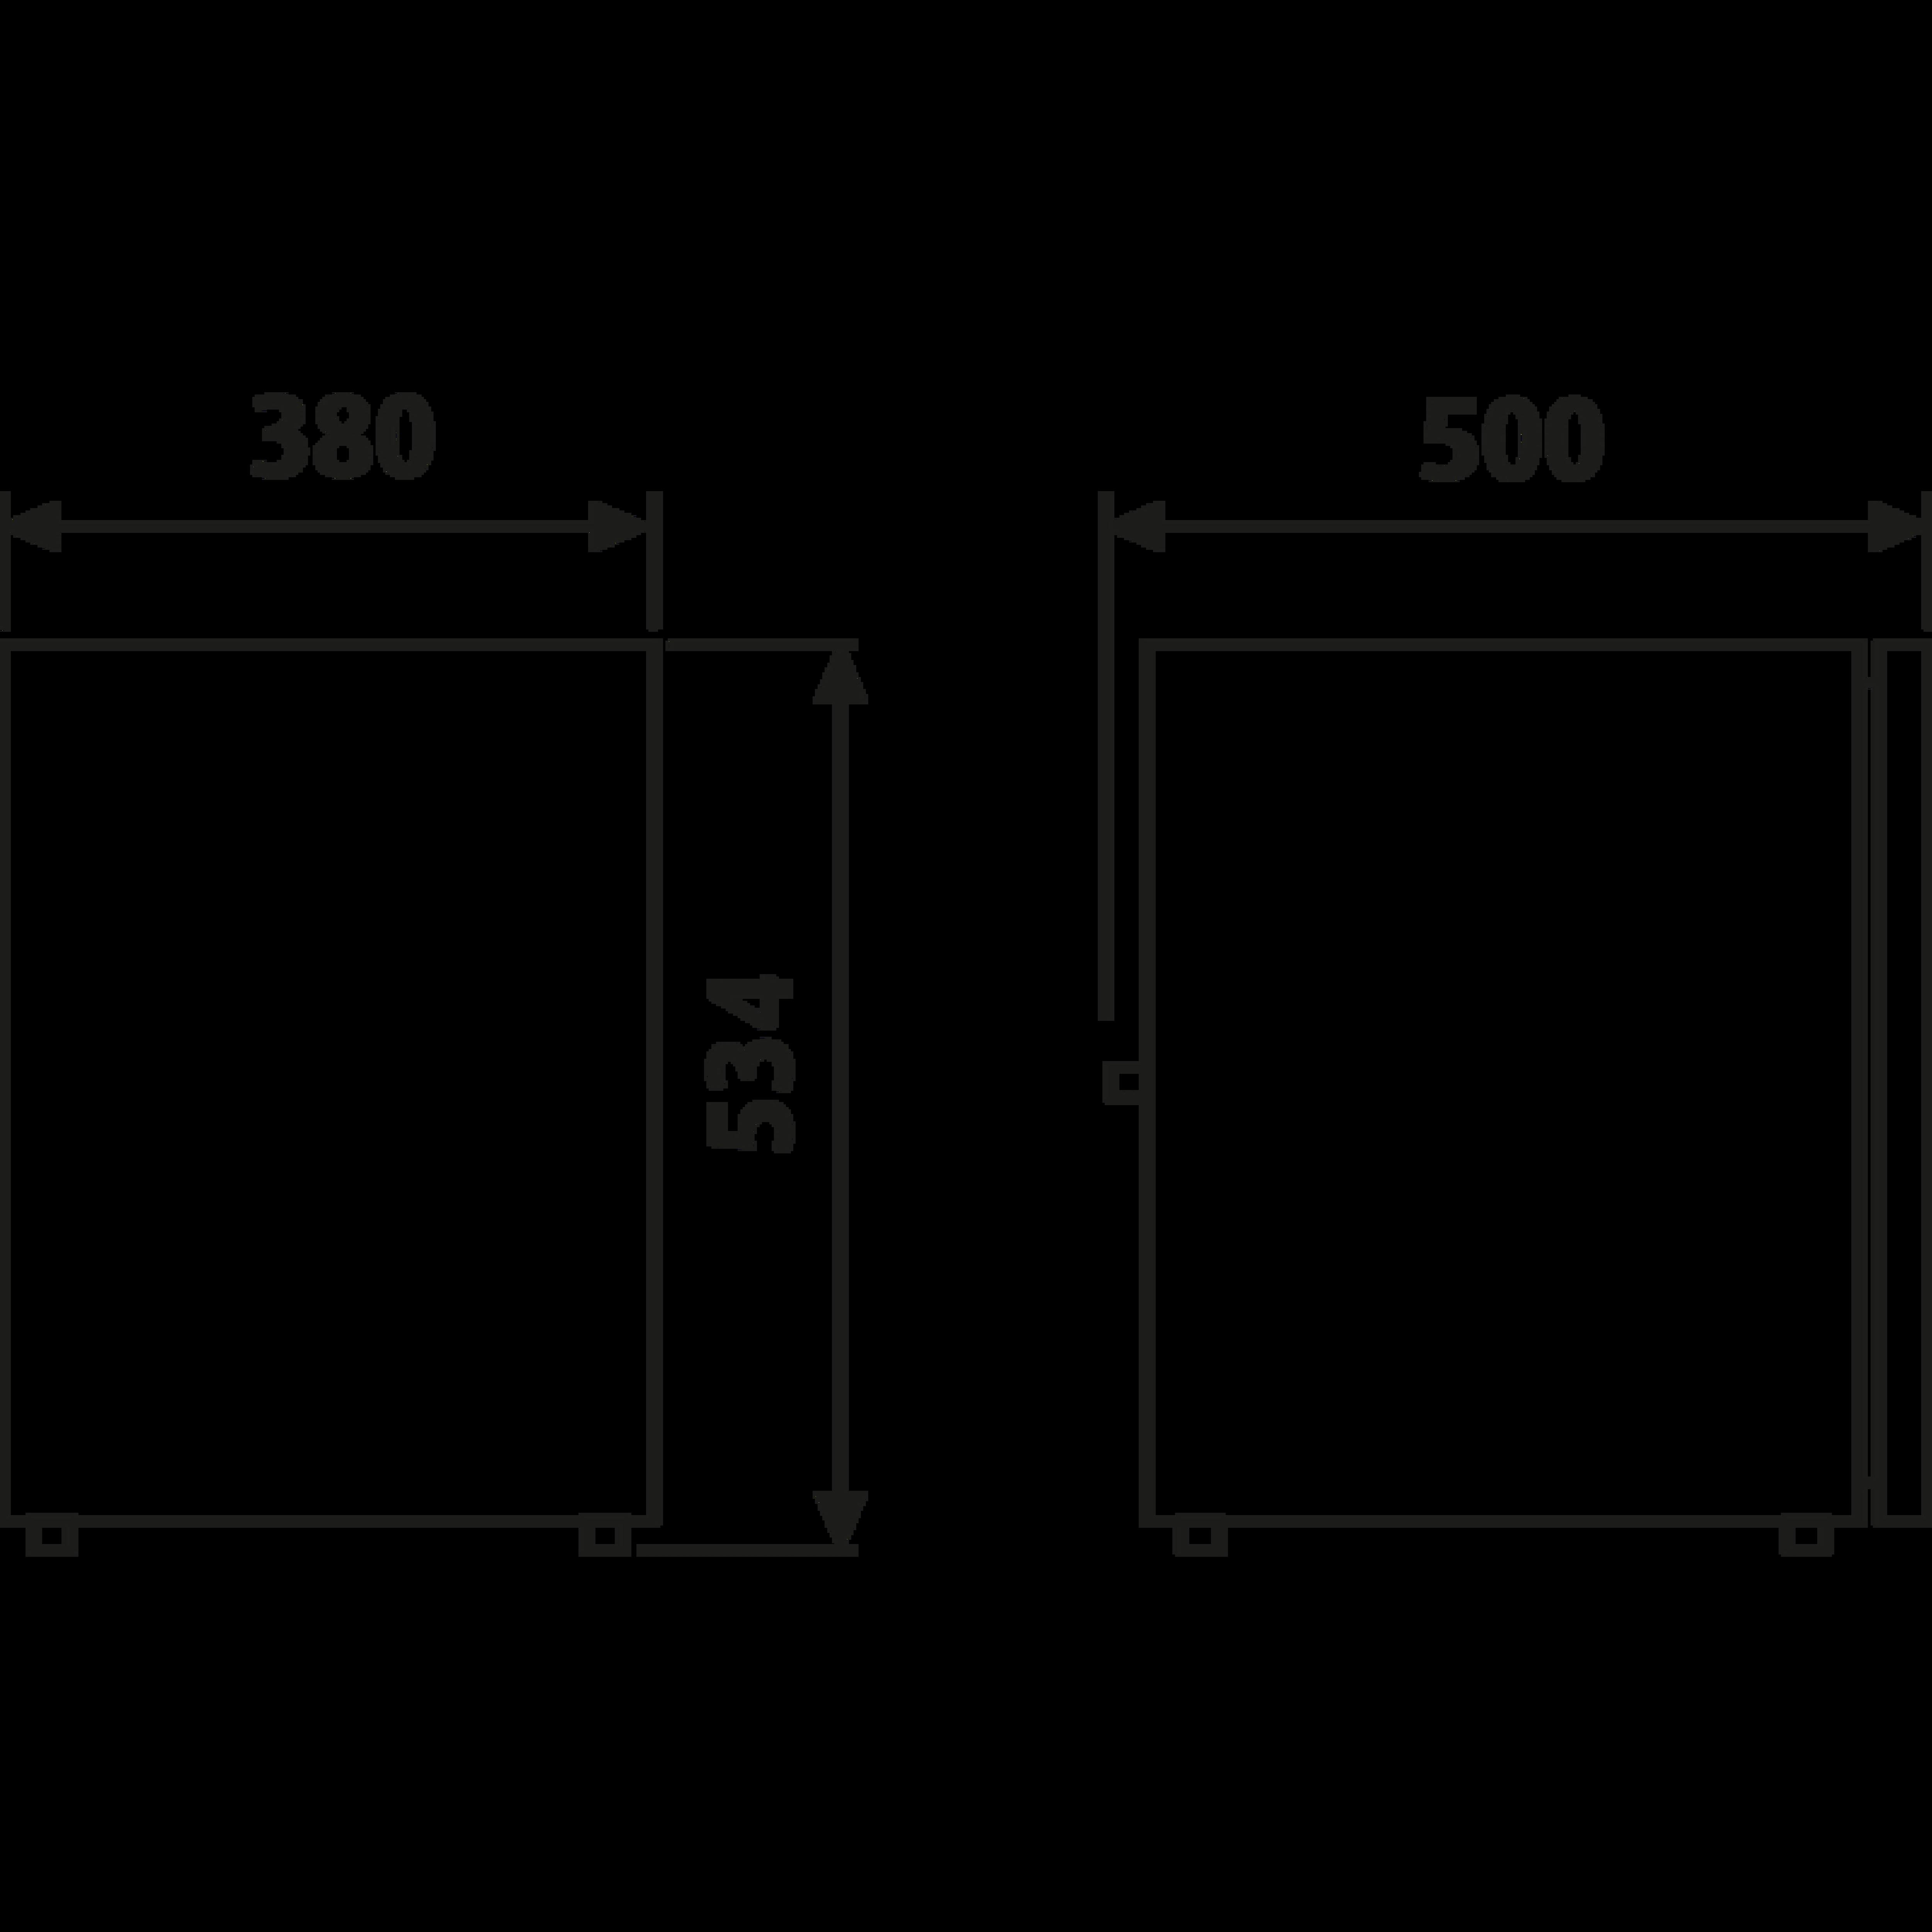 CRX 50 Dimensions